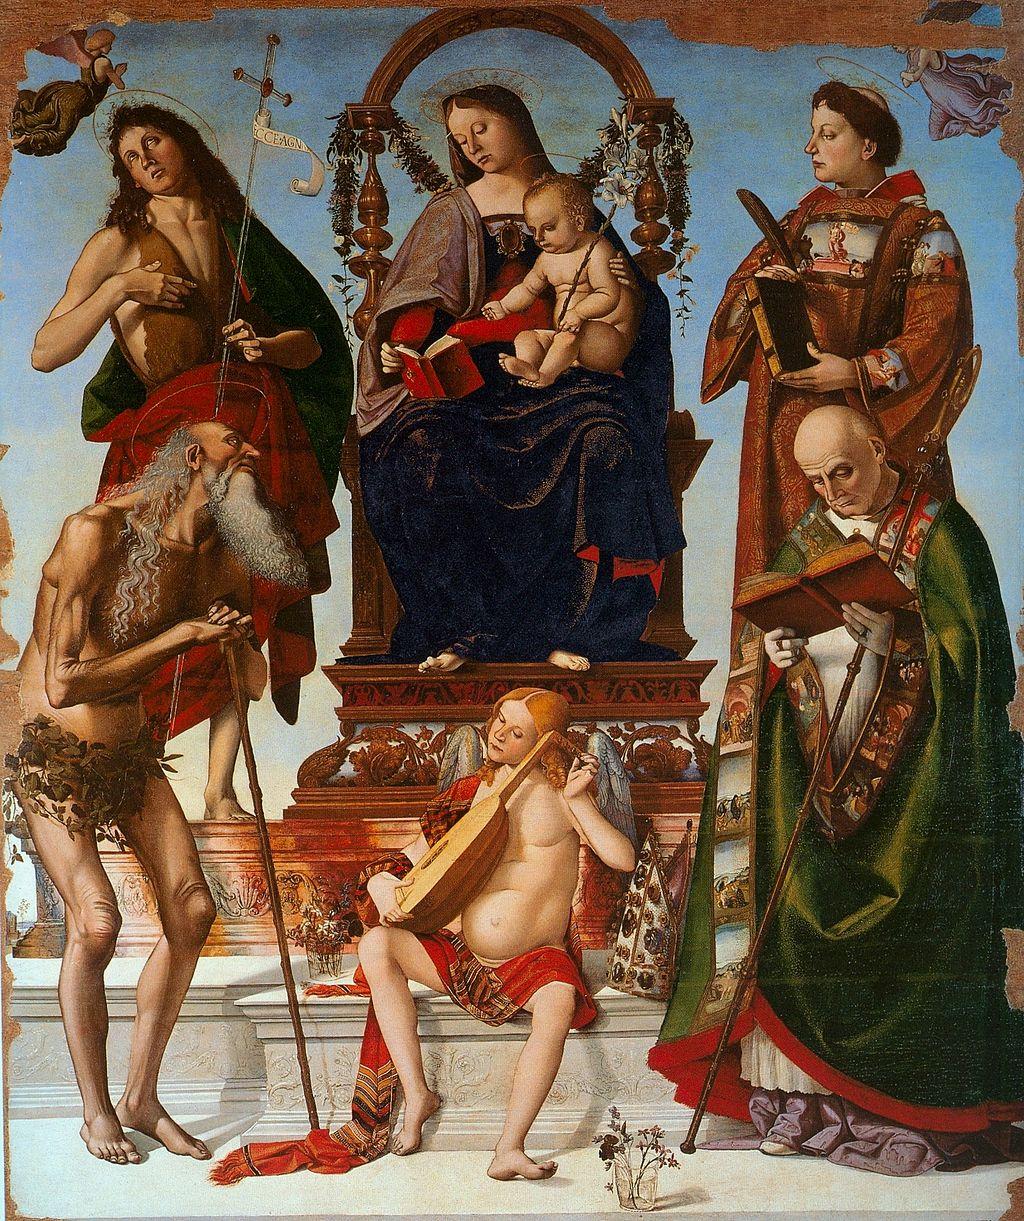 Pala di San Onofrio di Luca Signorelli